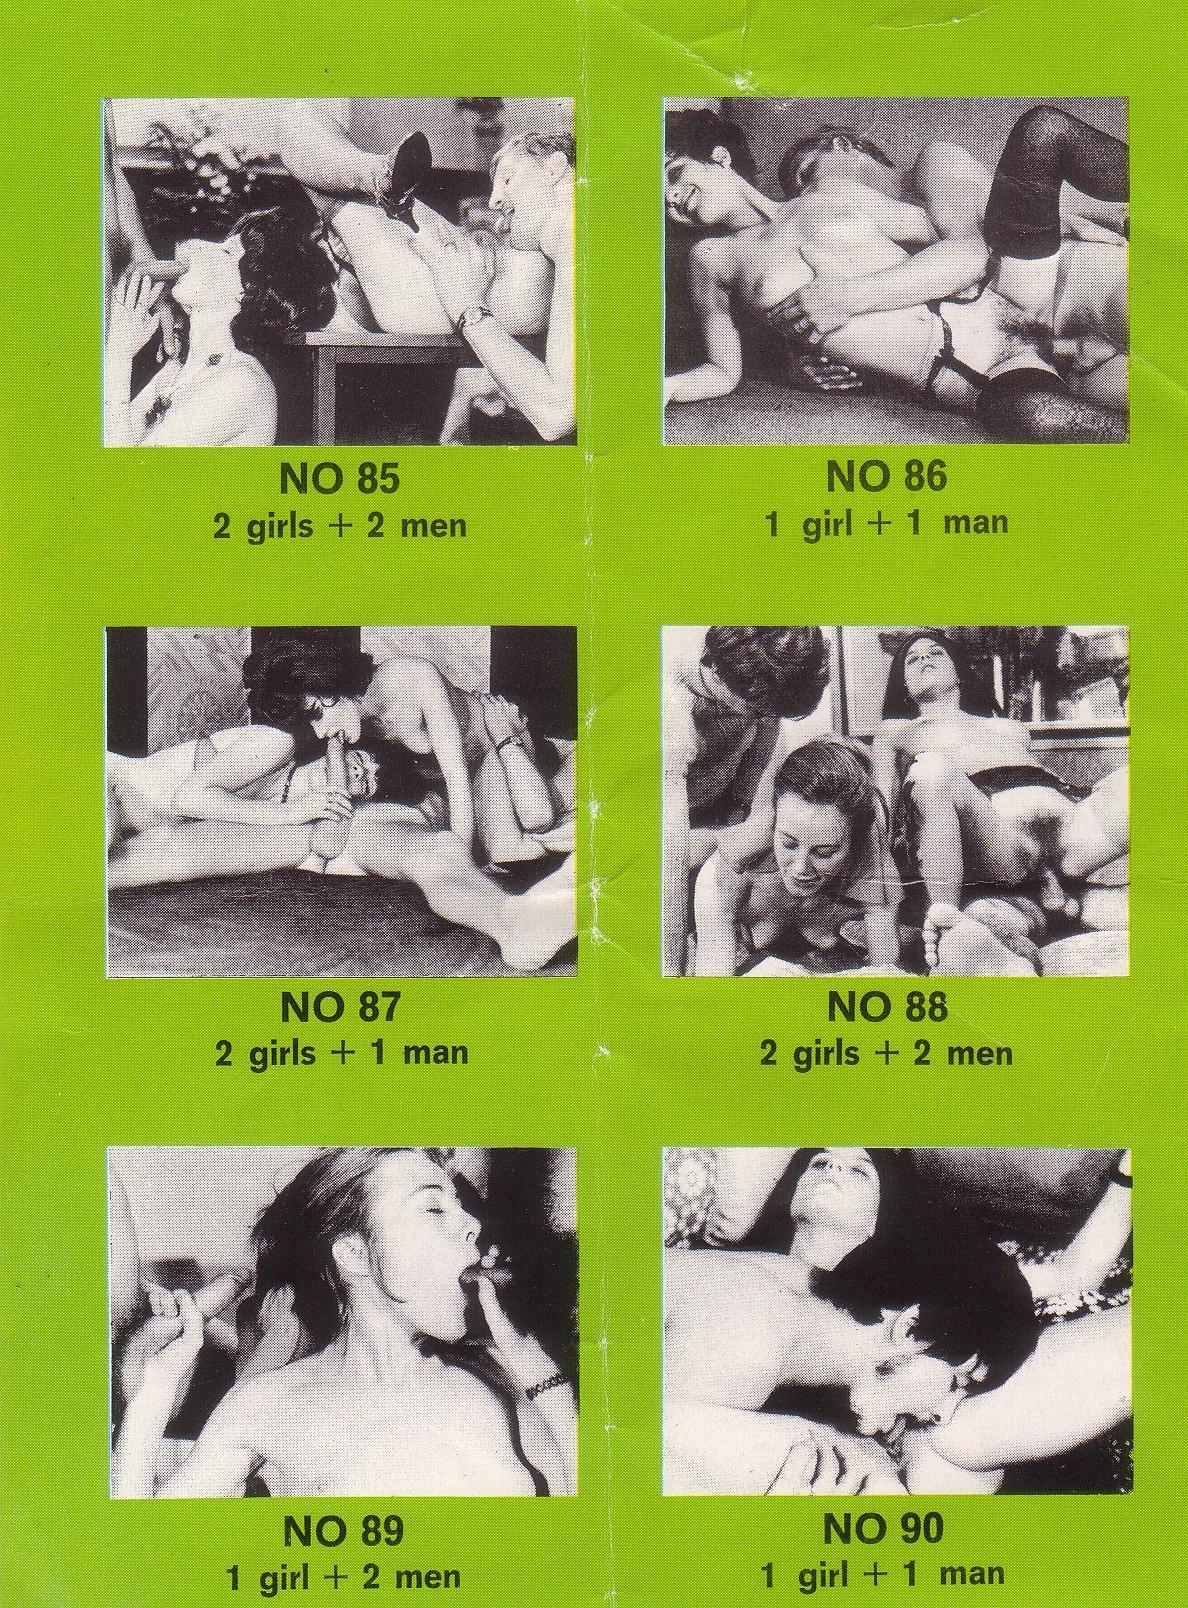 gratis danske sex film luxus luder